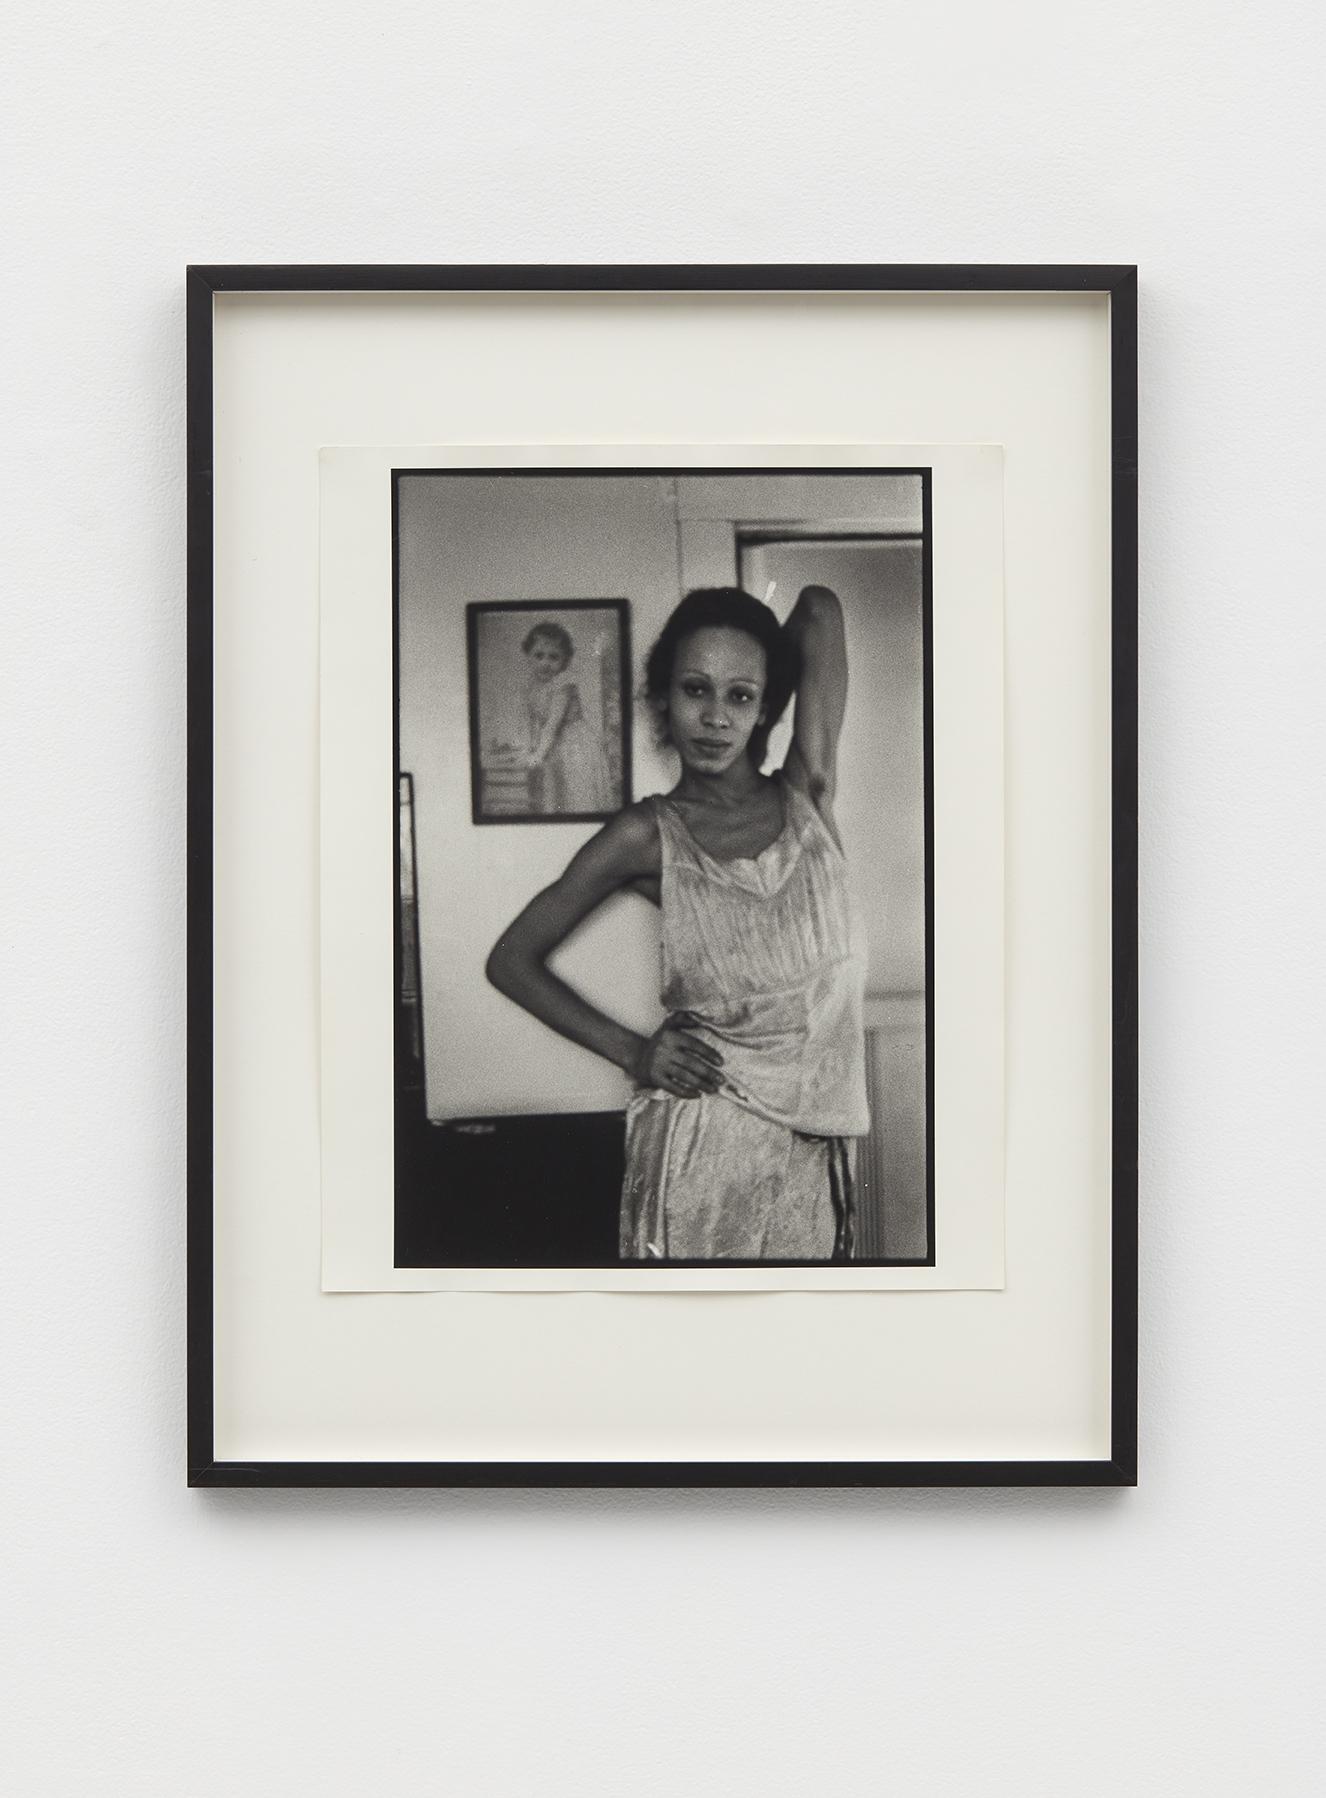 Nan Goldin, Bea in The Kitchen, 1972 silver gelatin print 72 x 56 cm - 28 11/32 x 22 1/16 inches (framed)